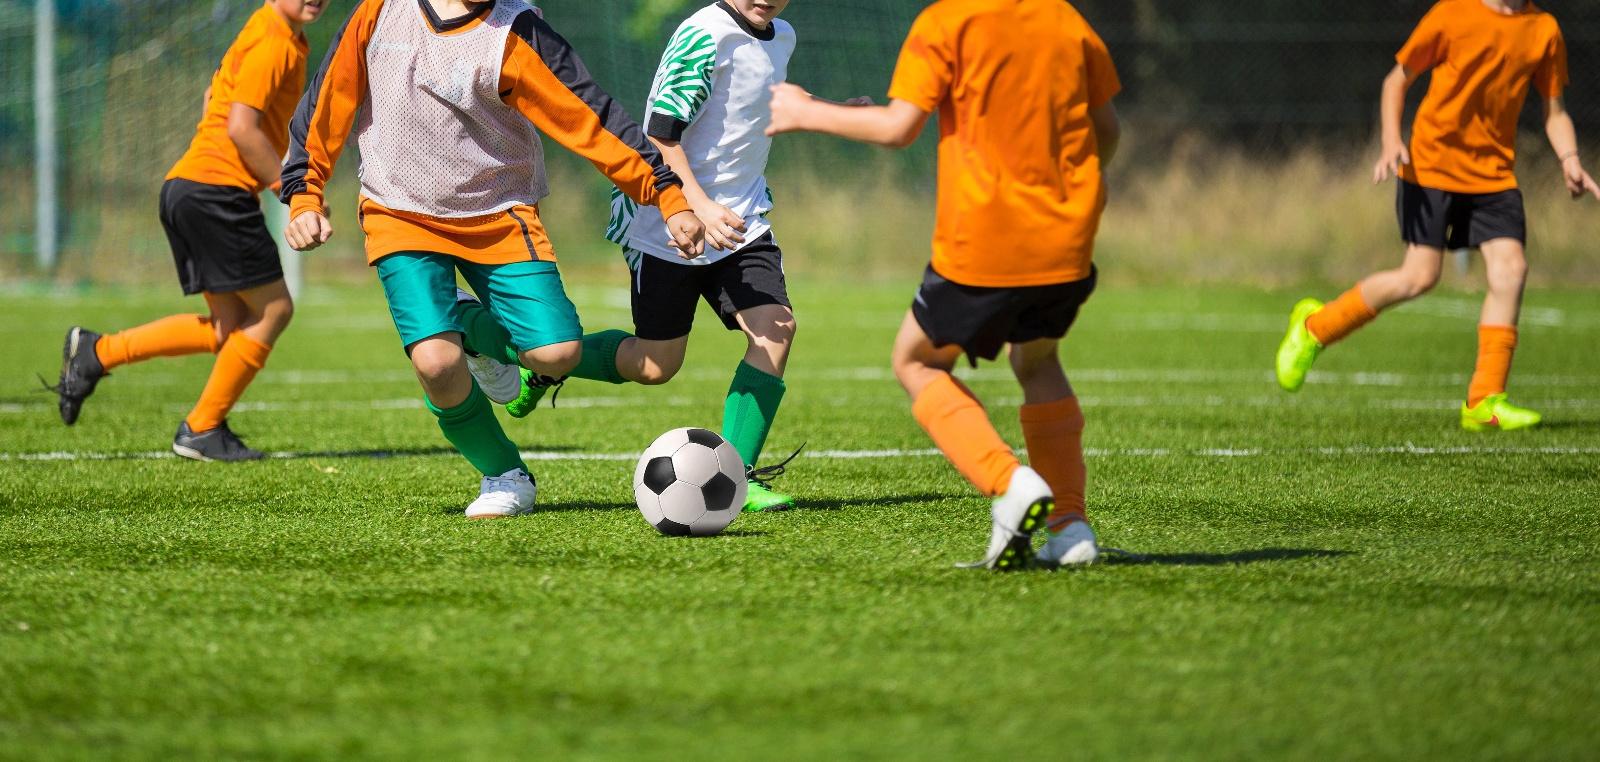 sports club management software